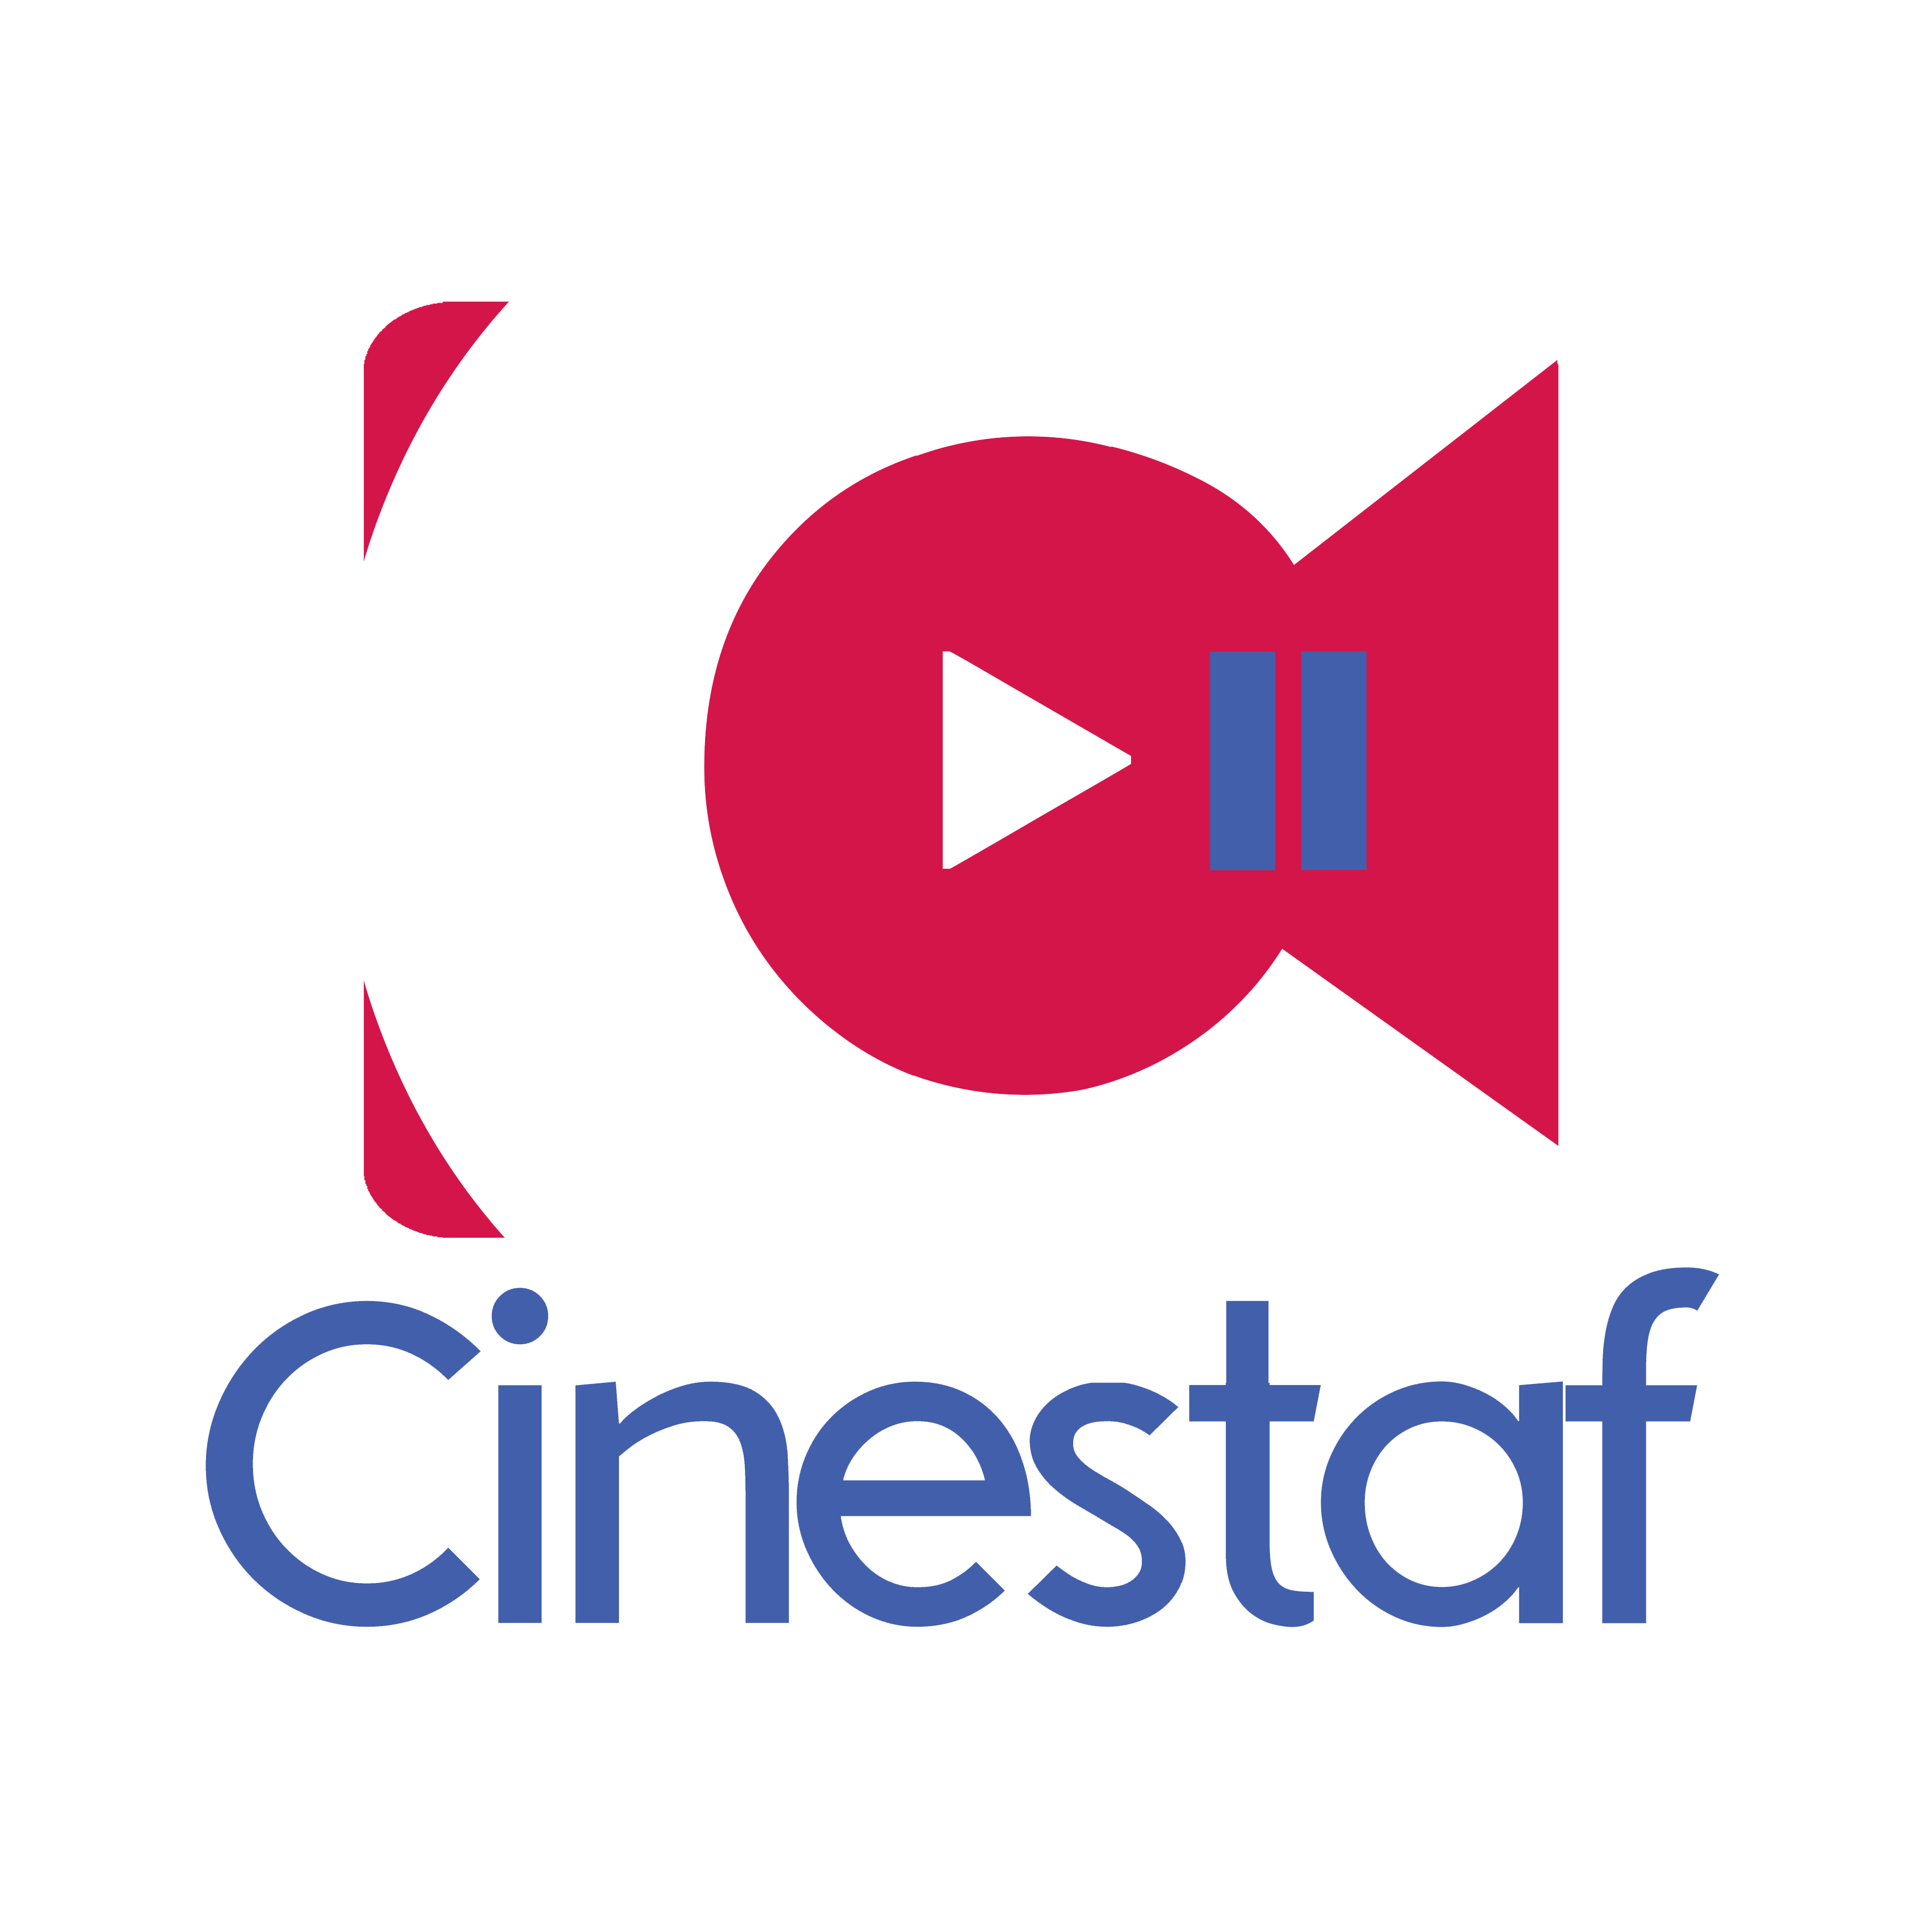 CINESTAF